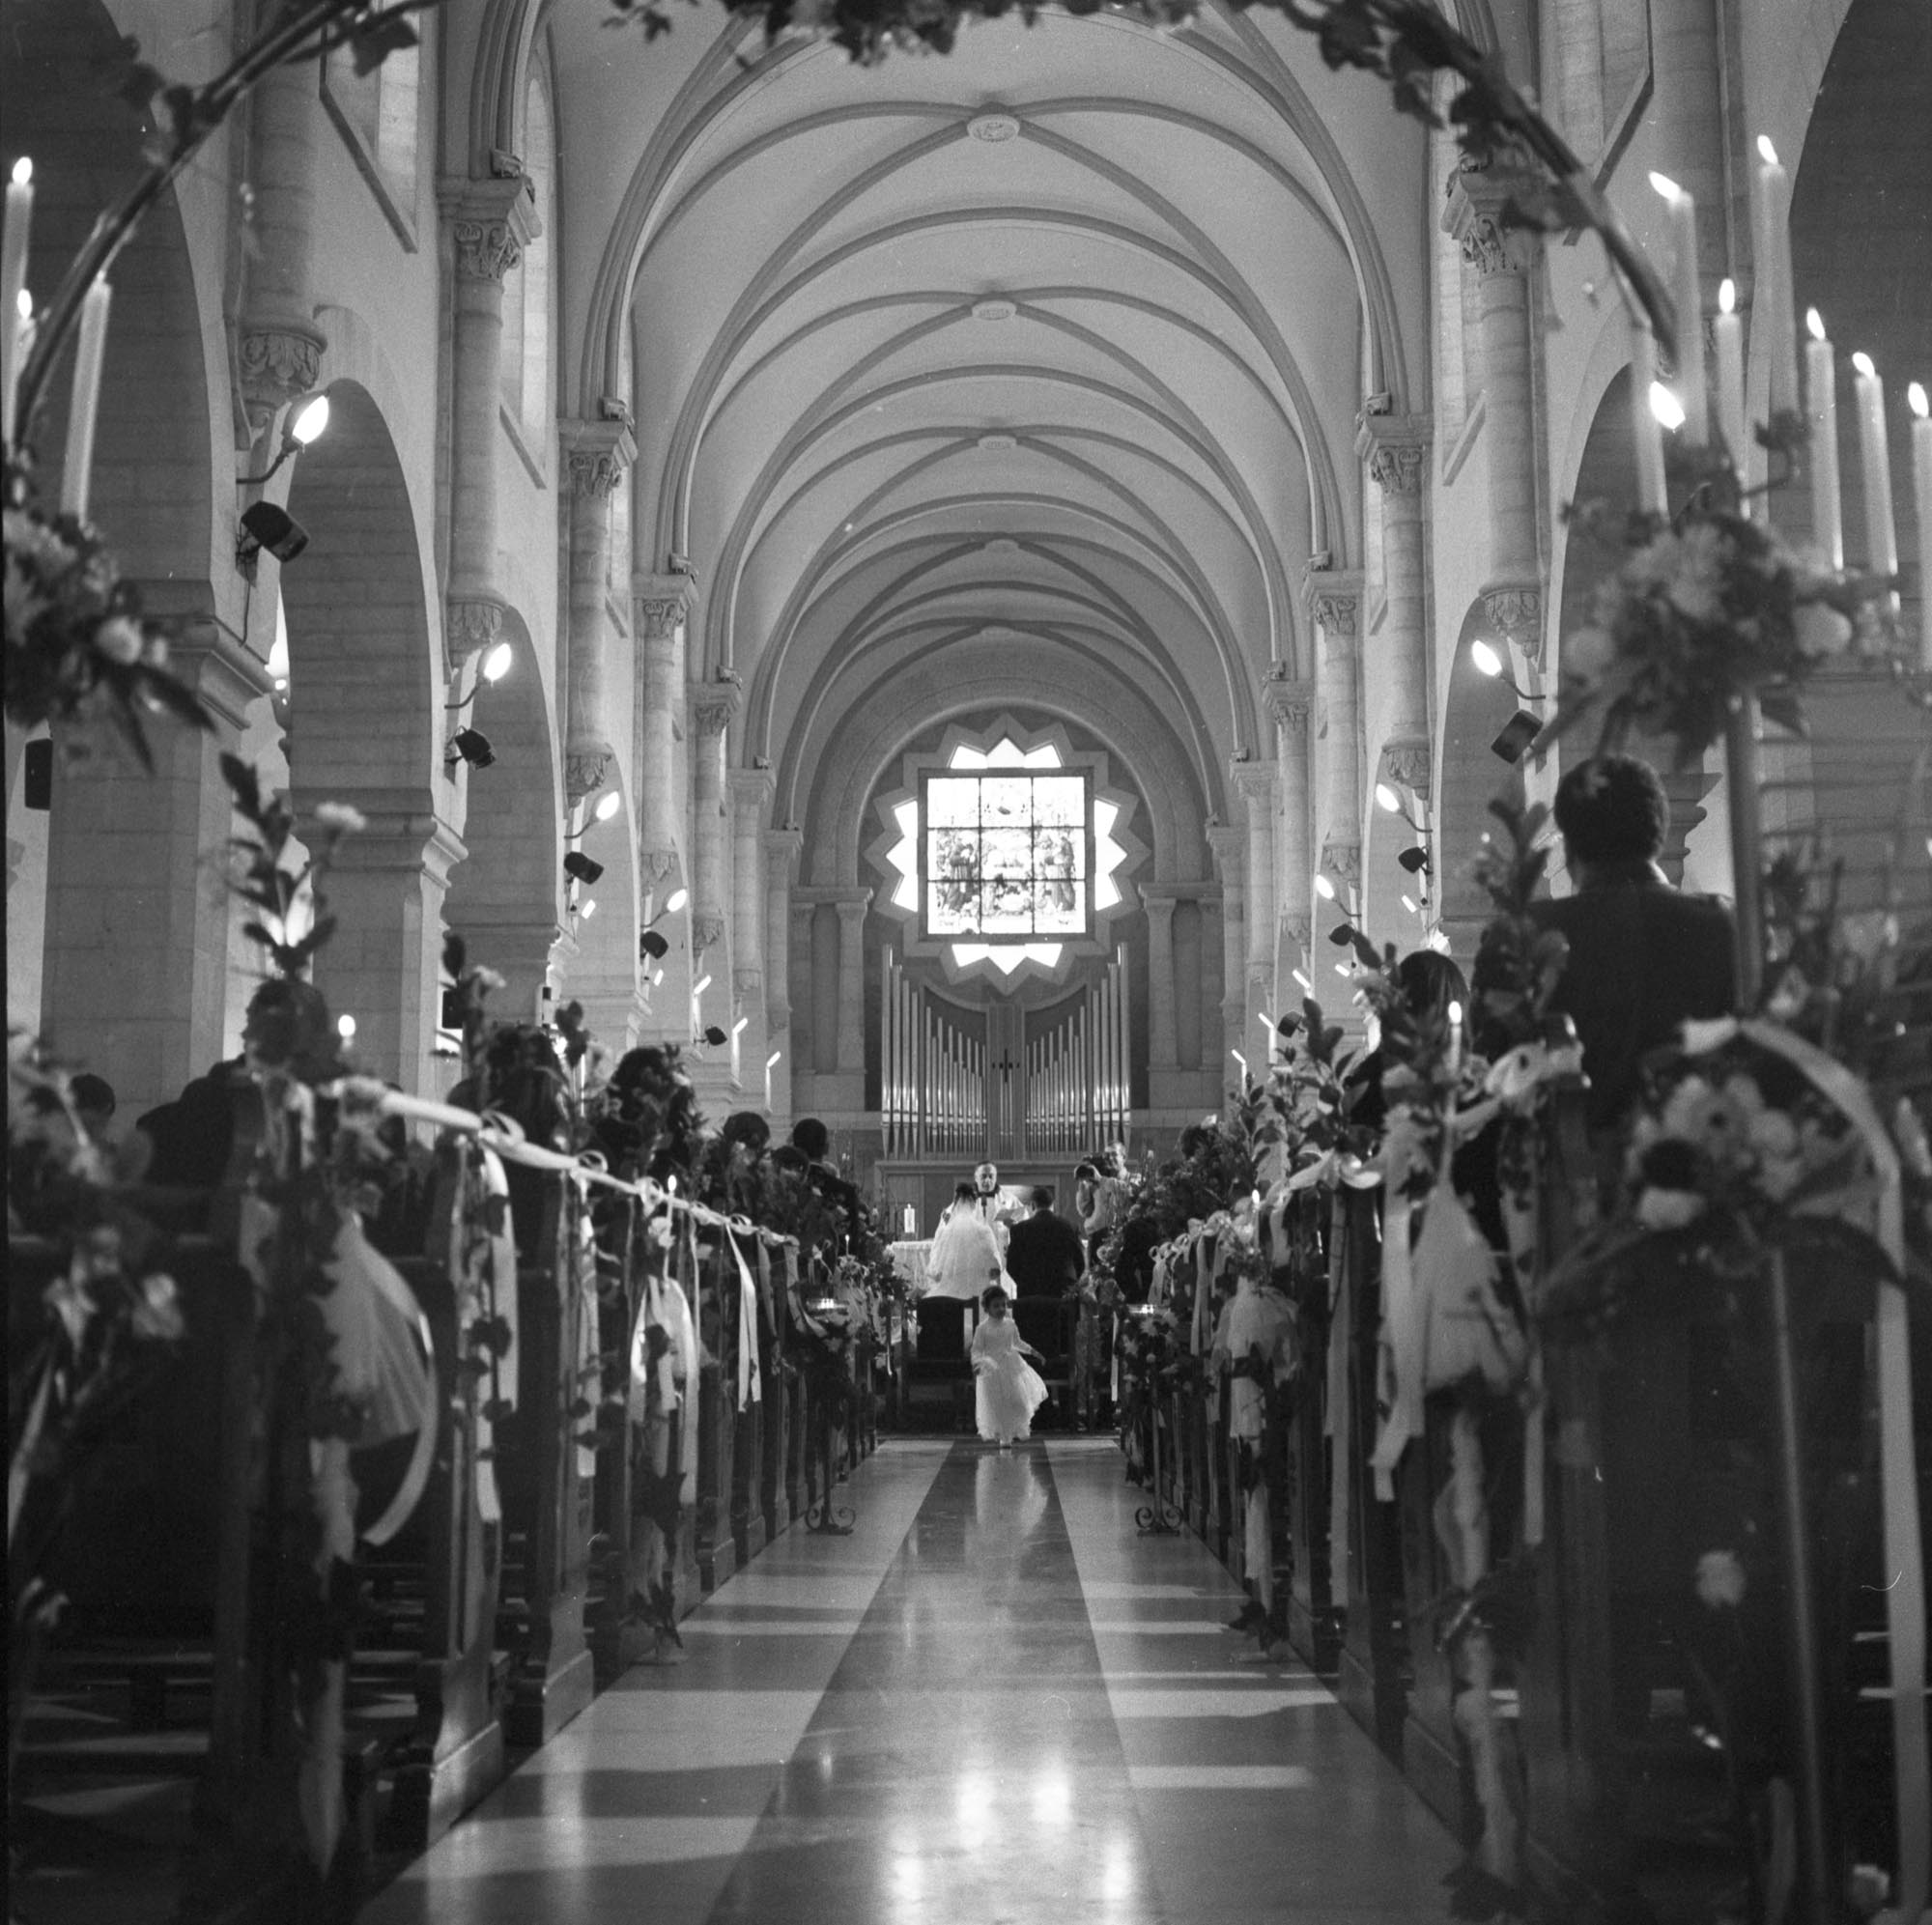 Catholic Wedding, Church Of Nativity, Bethlehem 2003